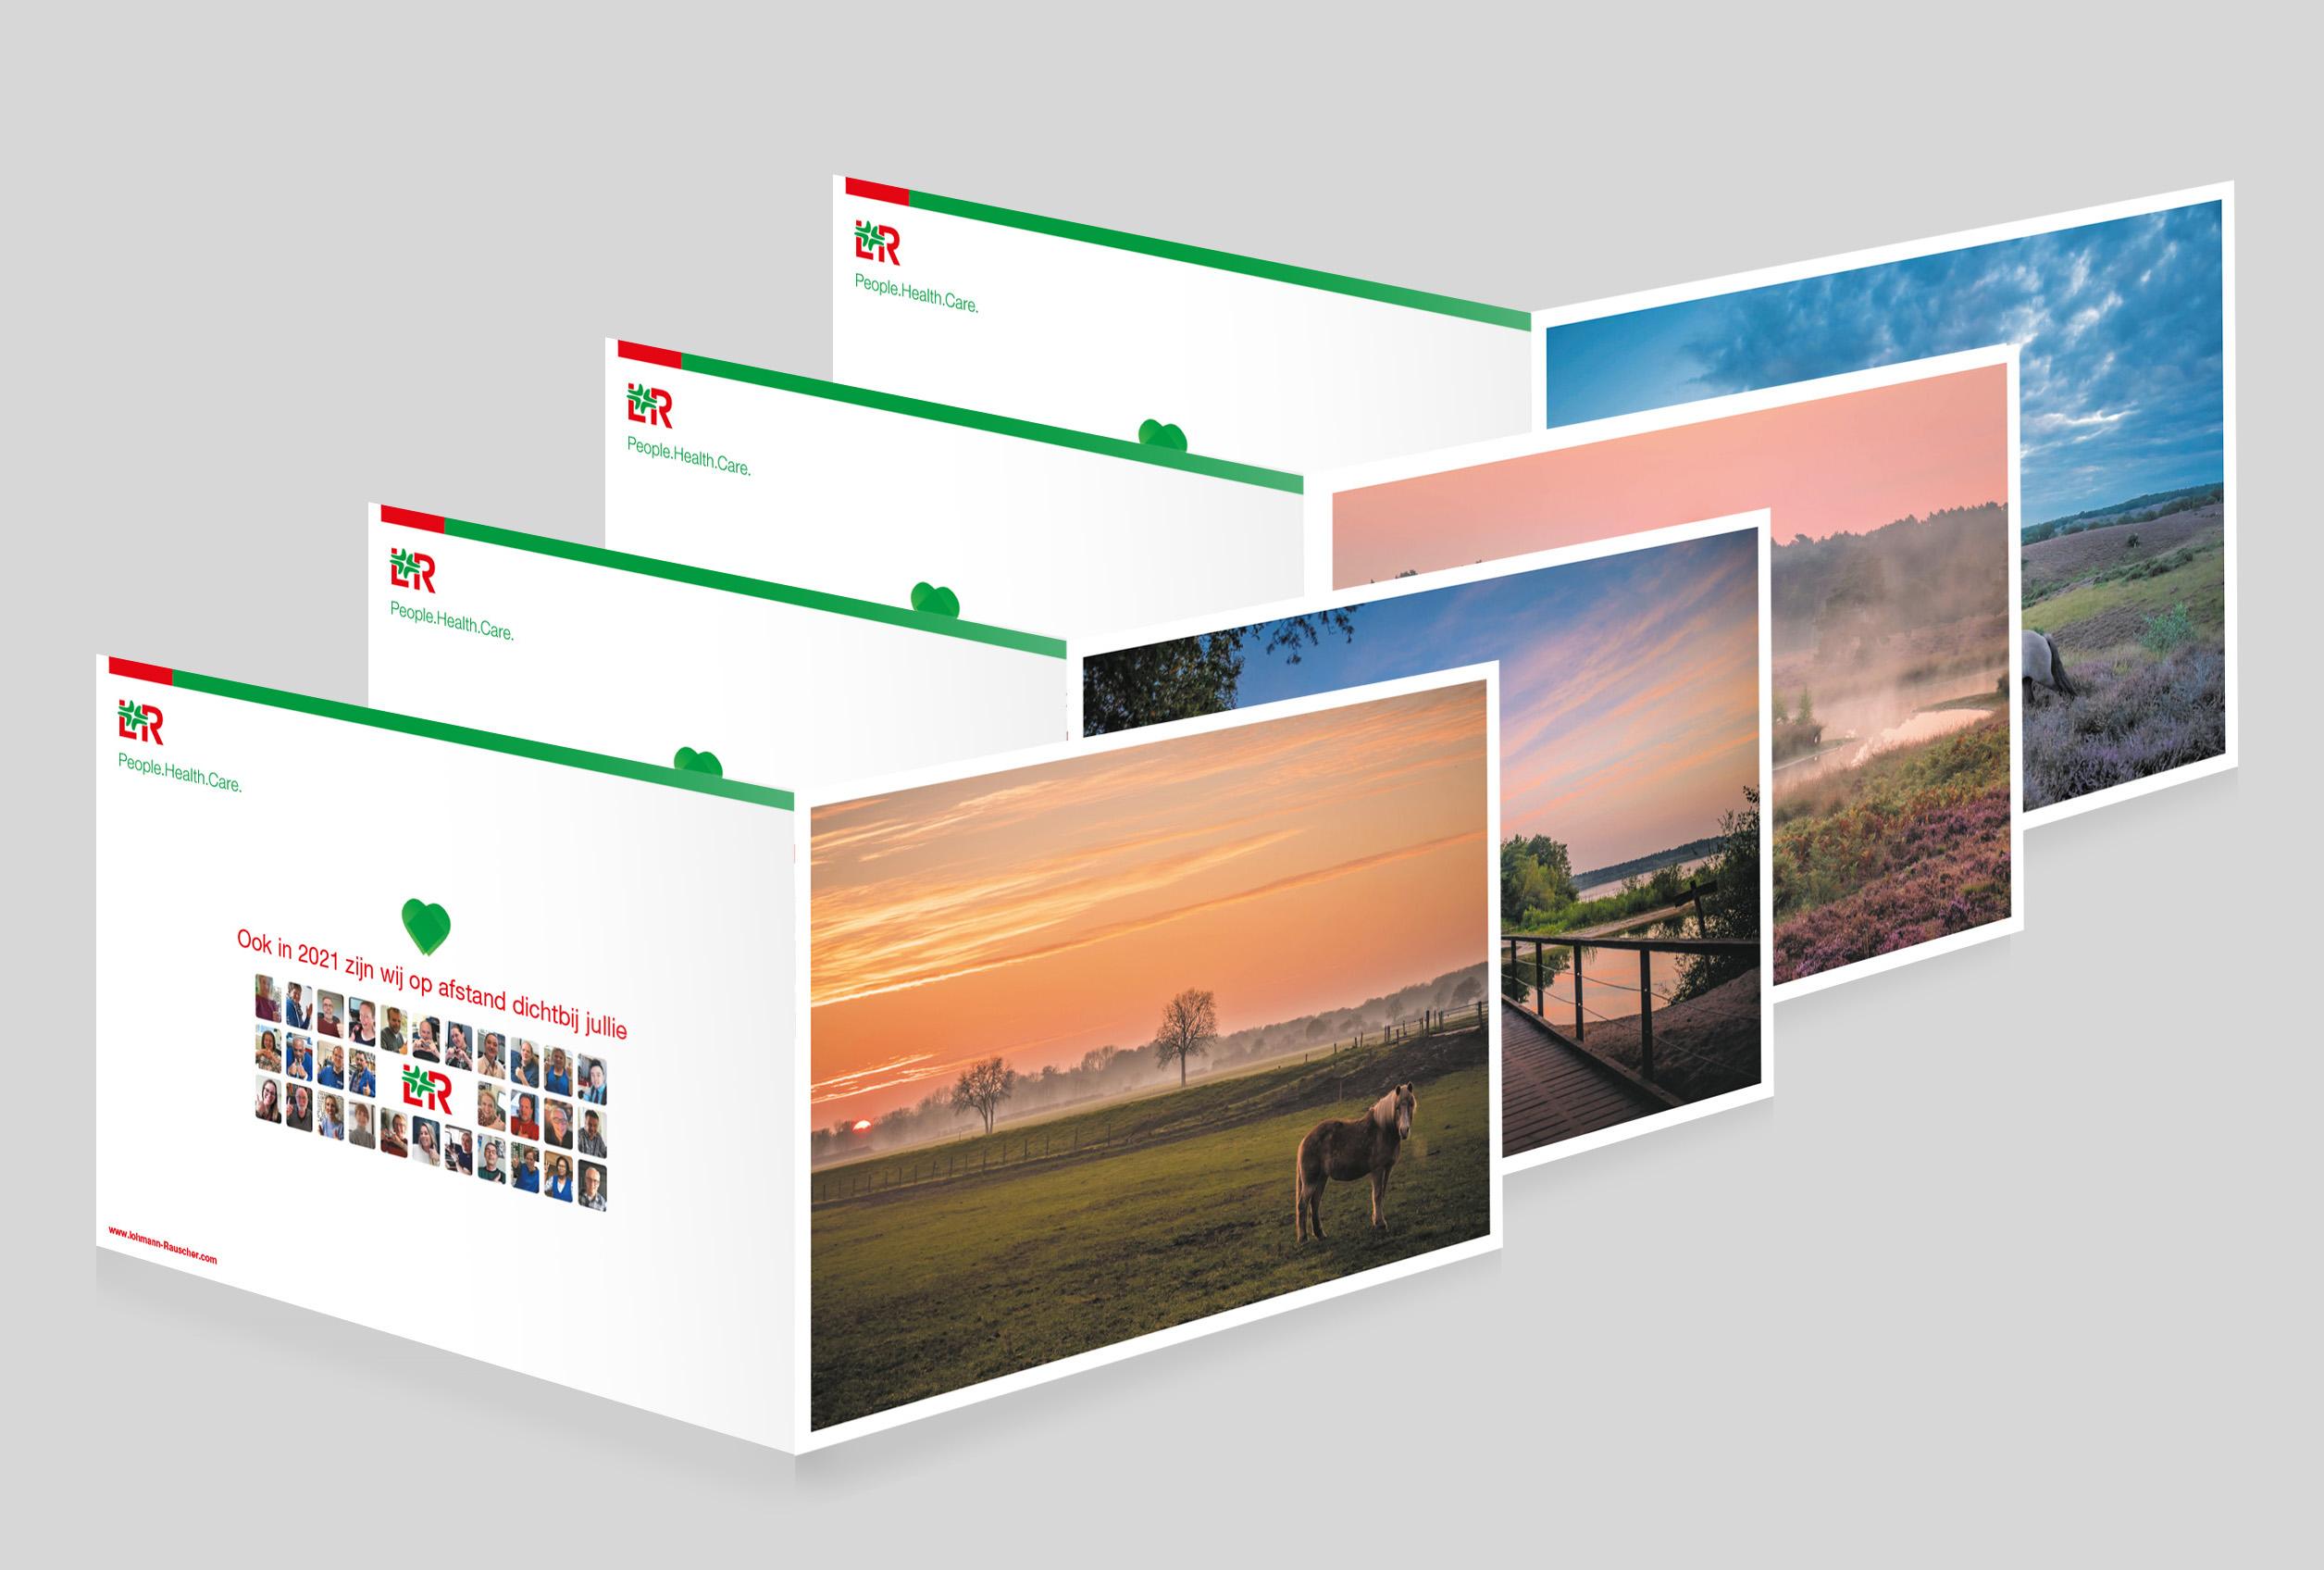 L&R_artwork_ansichtkaarten_mailing_BAS! TECLAME & VORMGEVING